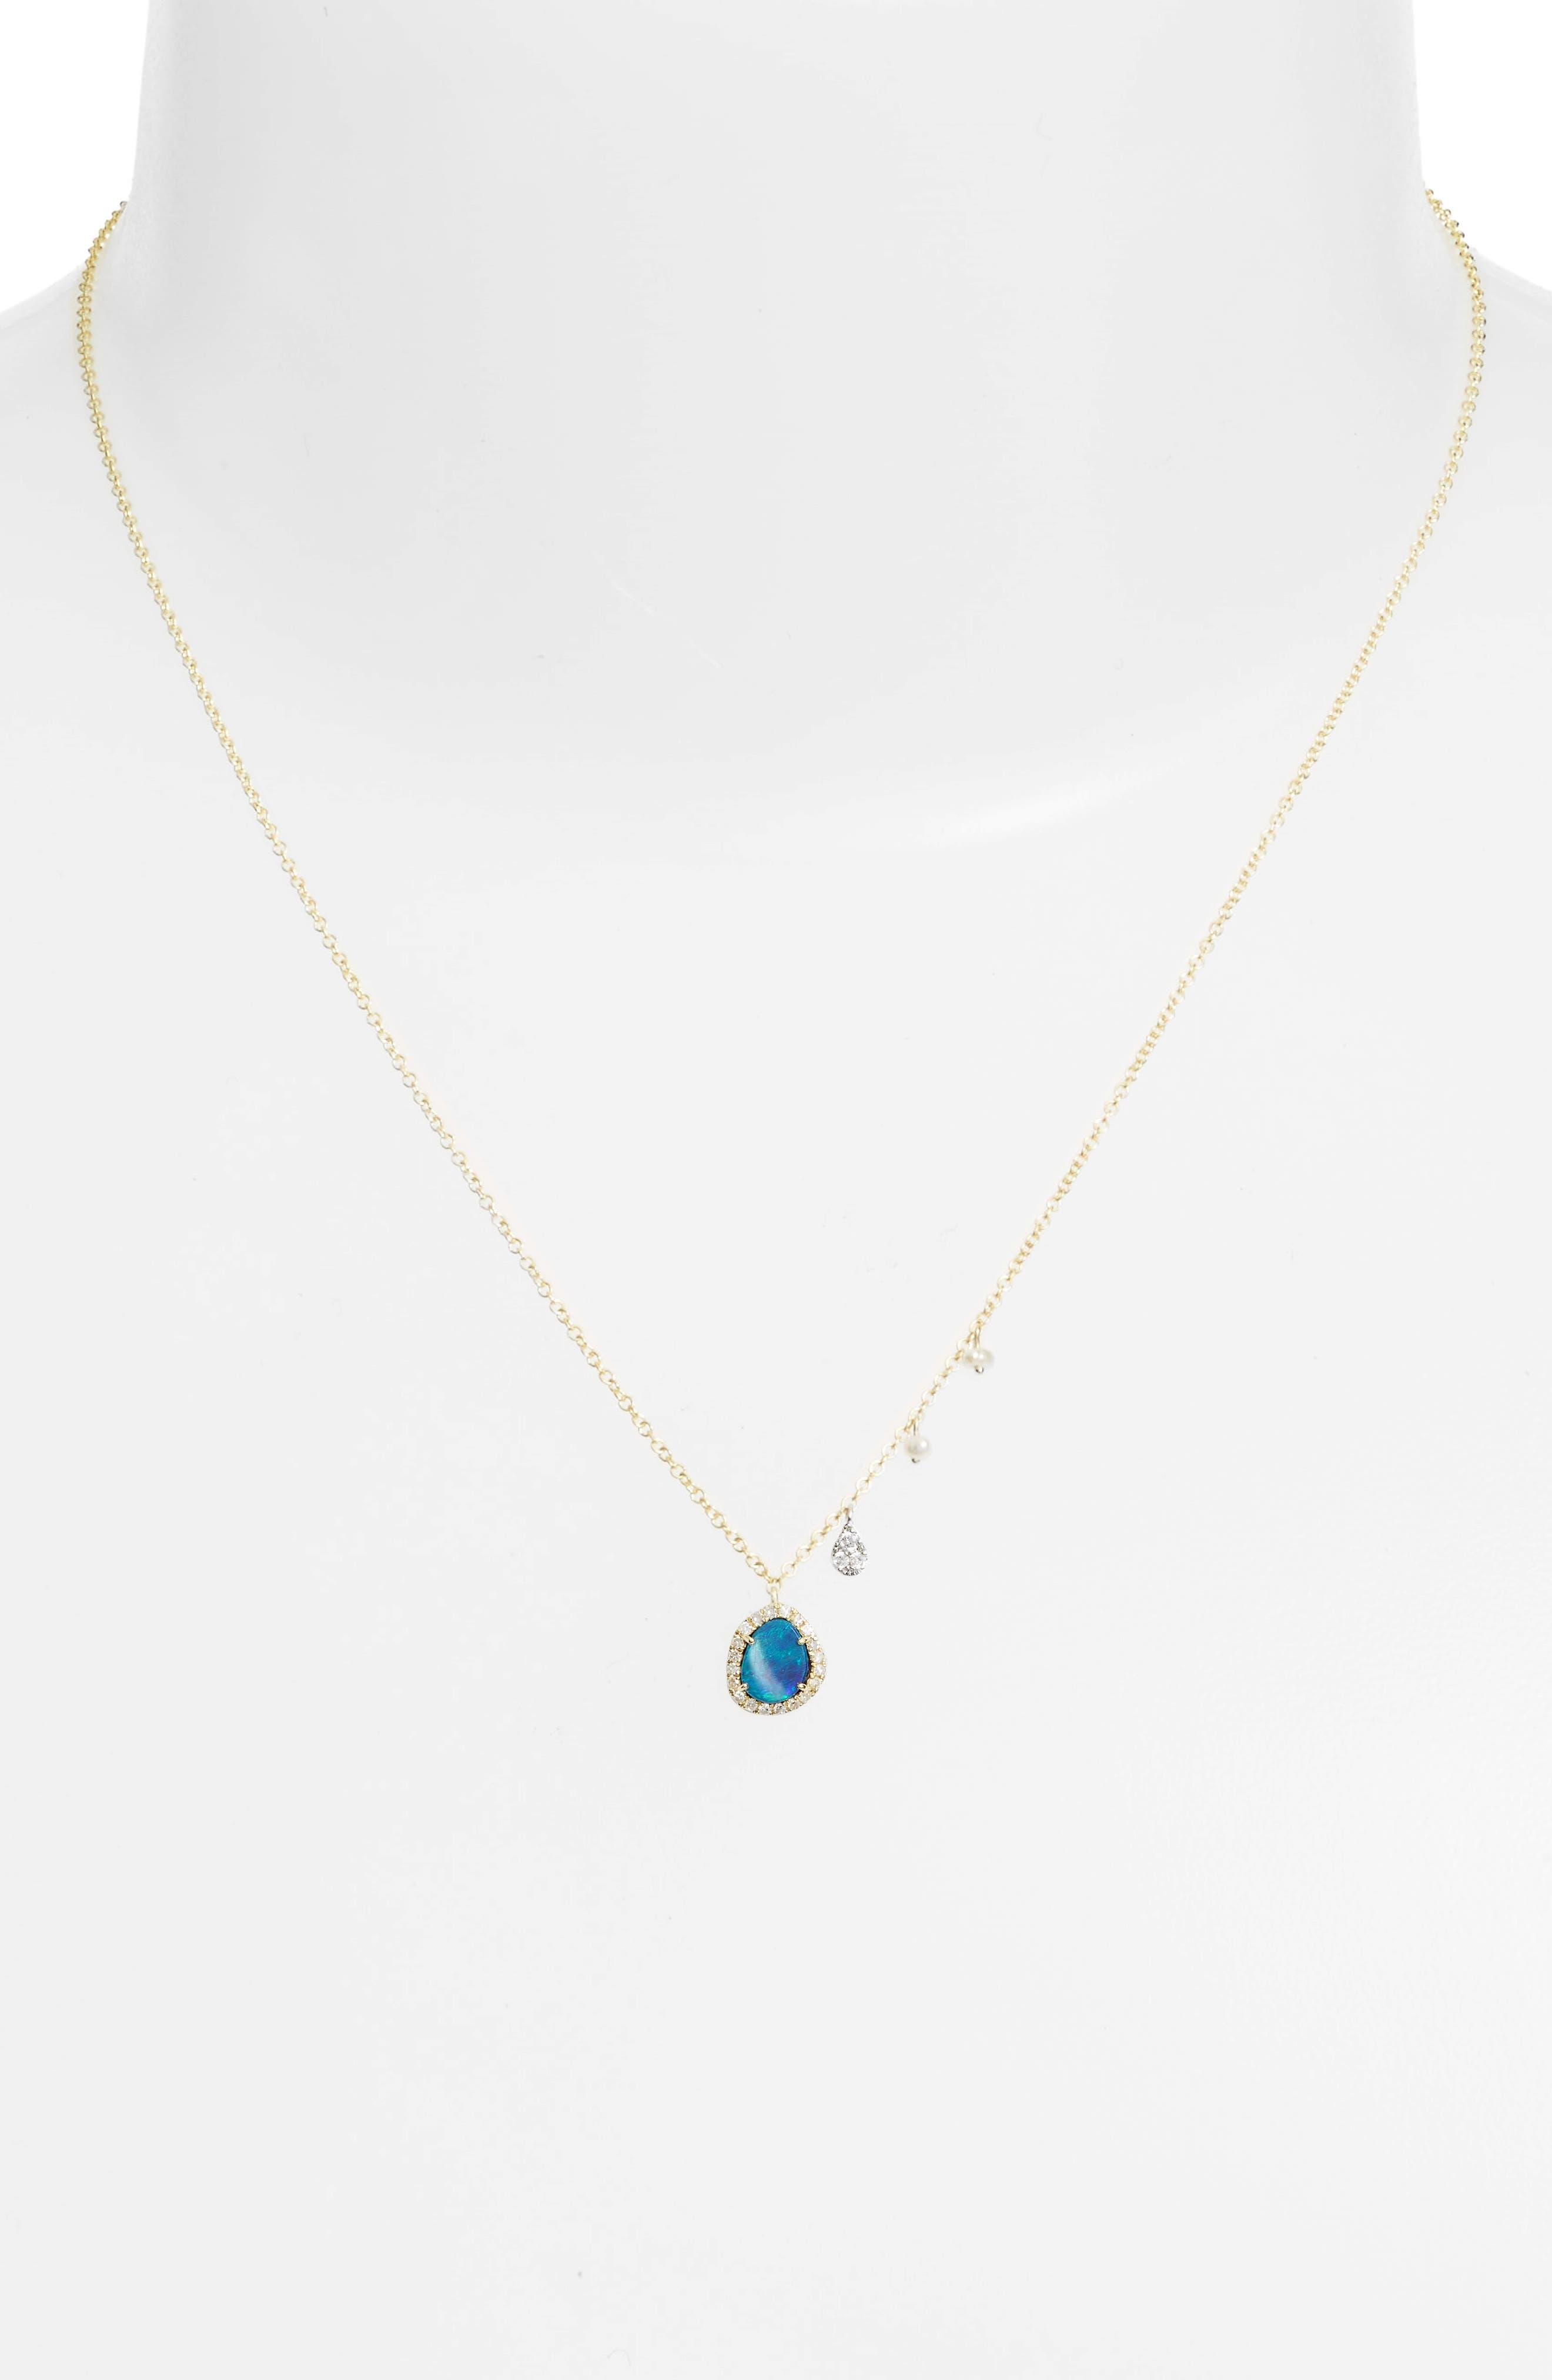 Mini Stone Diamond Pendant Necklace,                             Alternate thumbnail 2, color,                             YELLOW GOLD/ OPAL